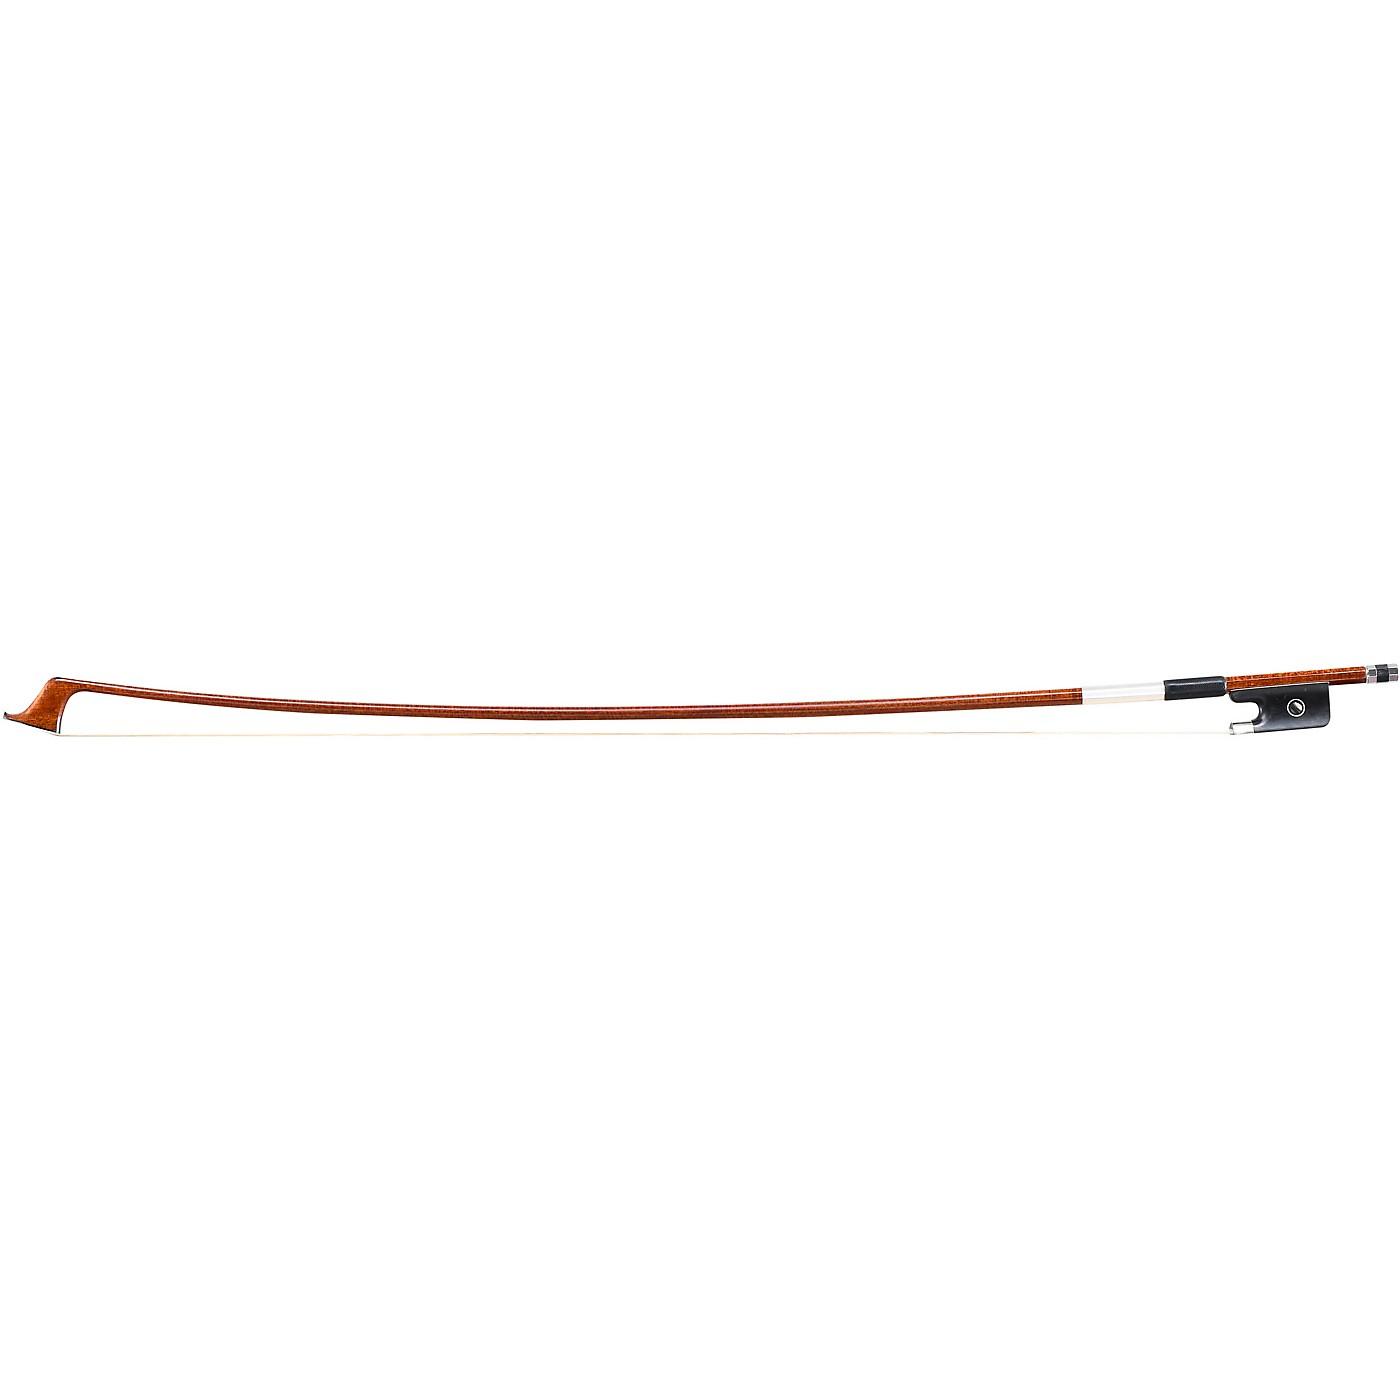 Artino Three Star Wood Veneer Carbon Fiber Cello Bow thumbnail